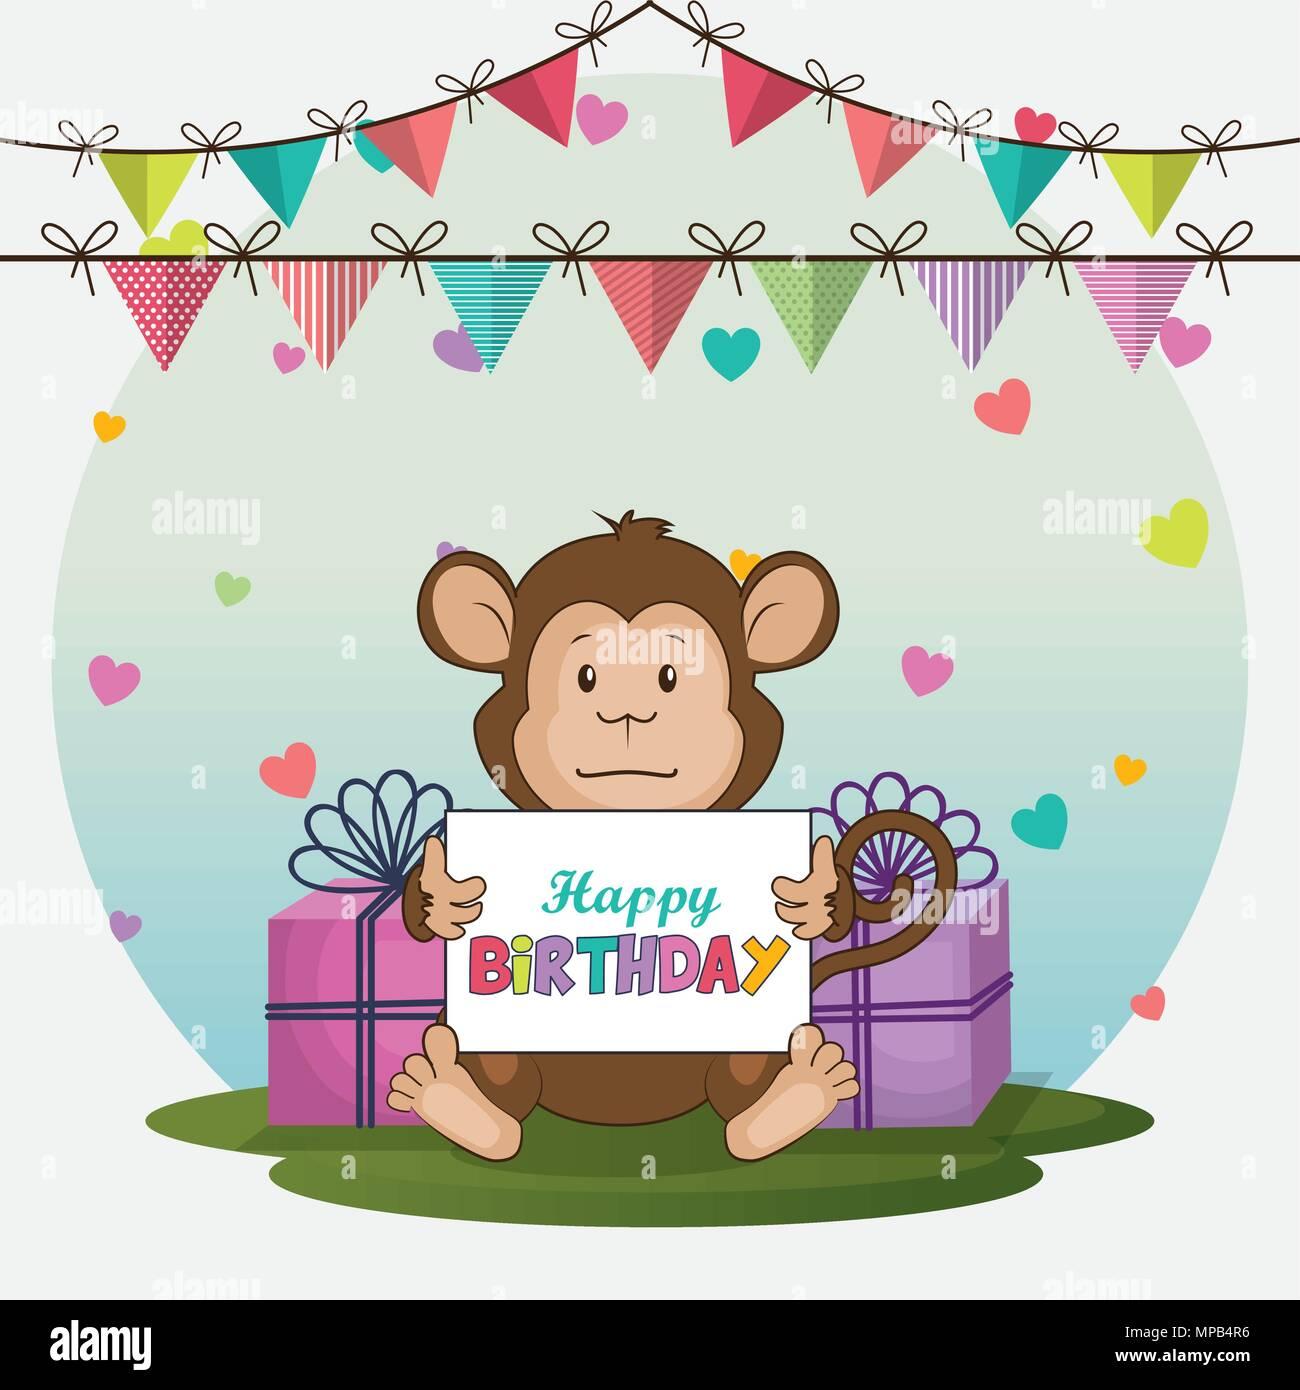 Happy Birthday Card With Cute Monkey